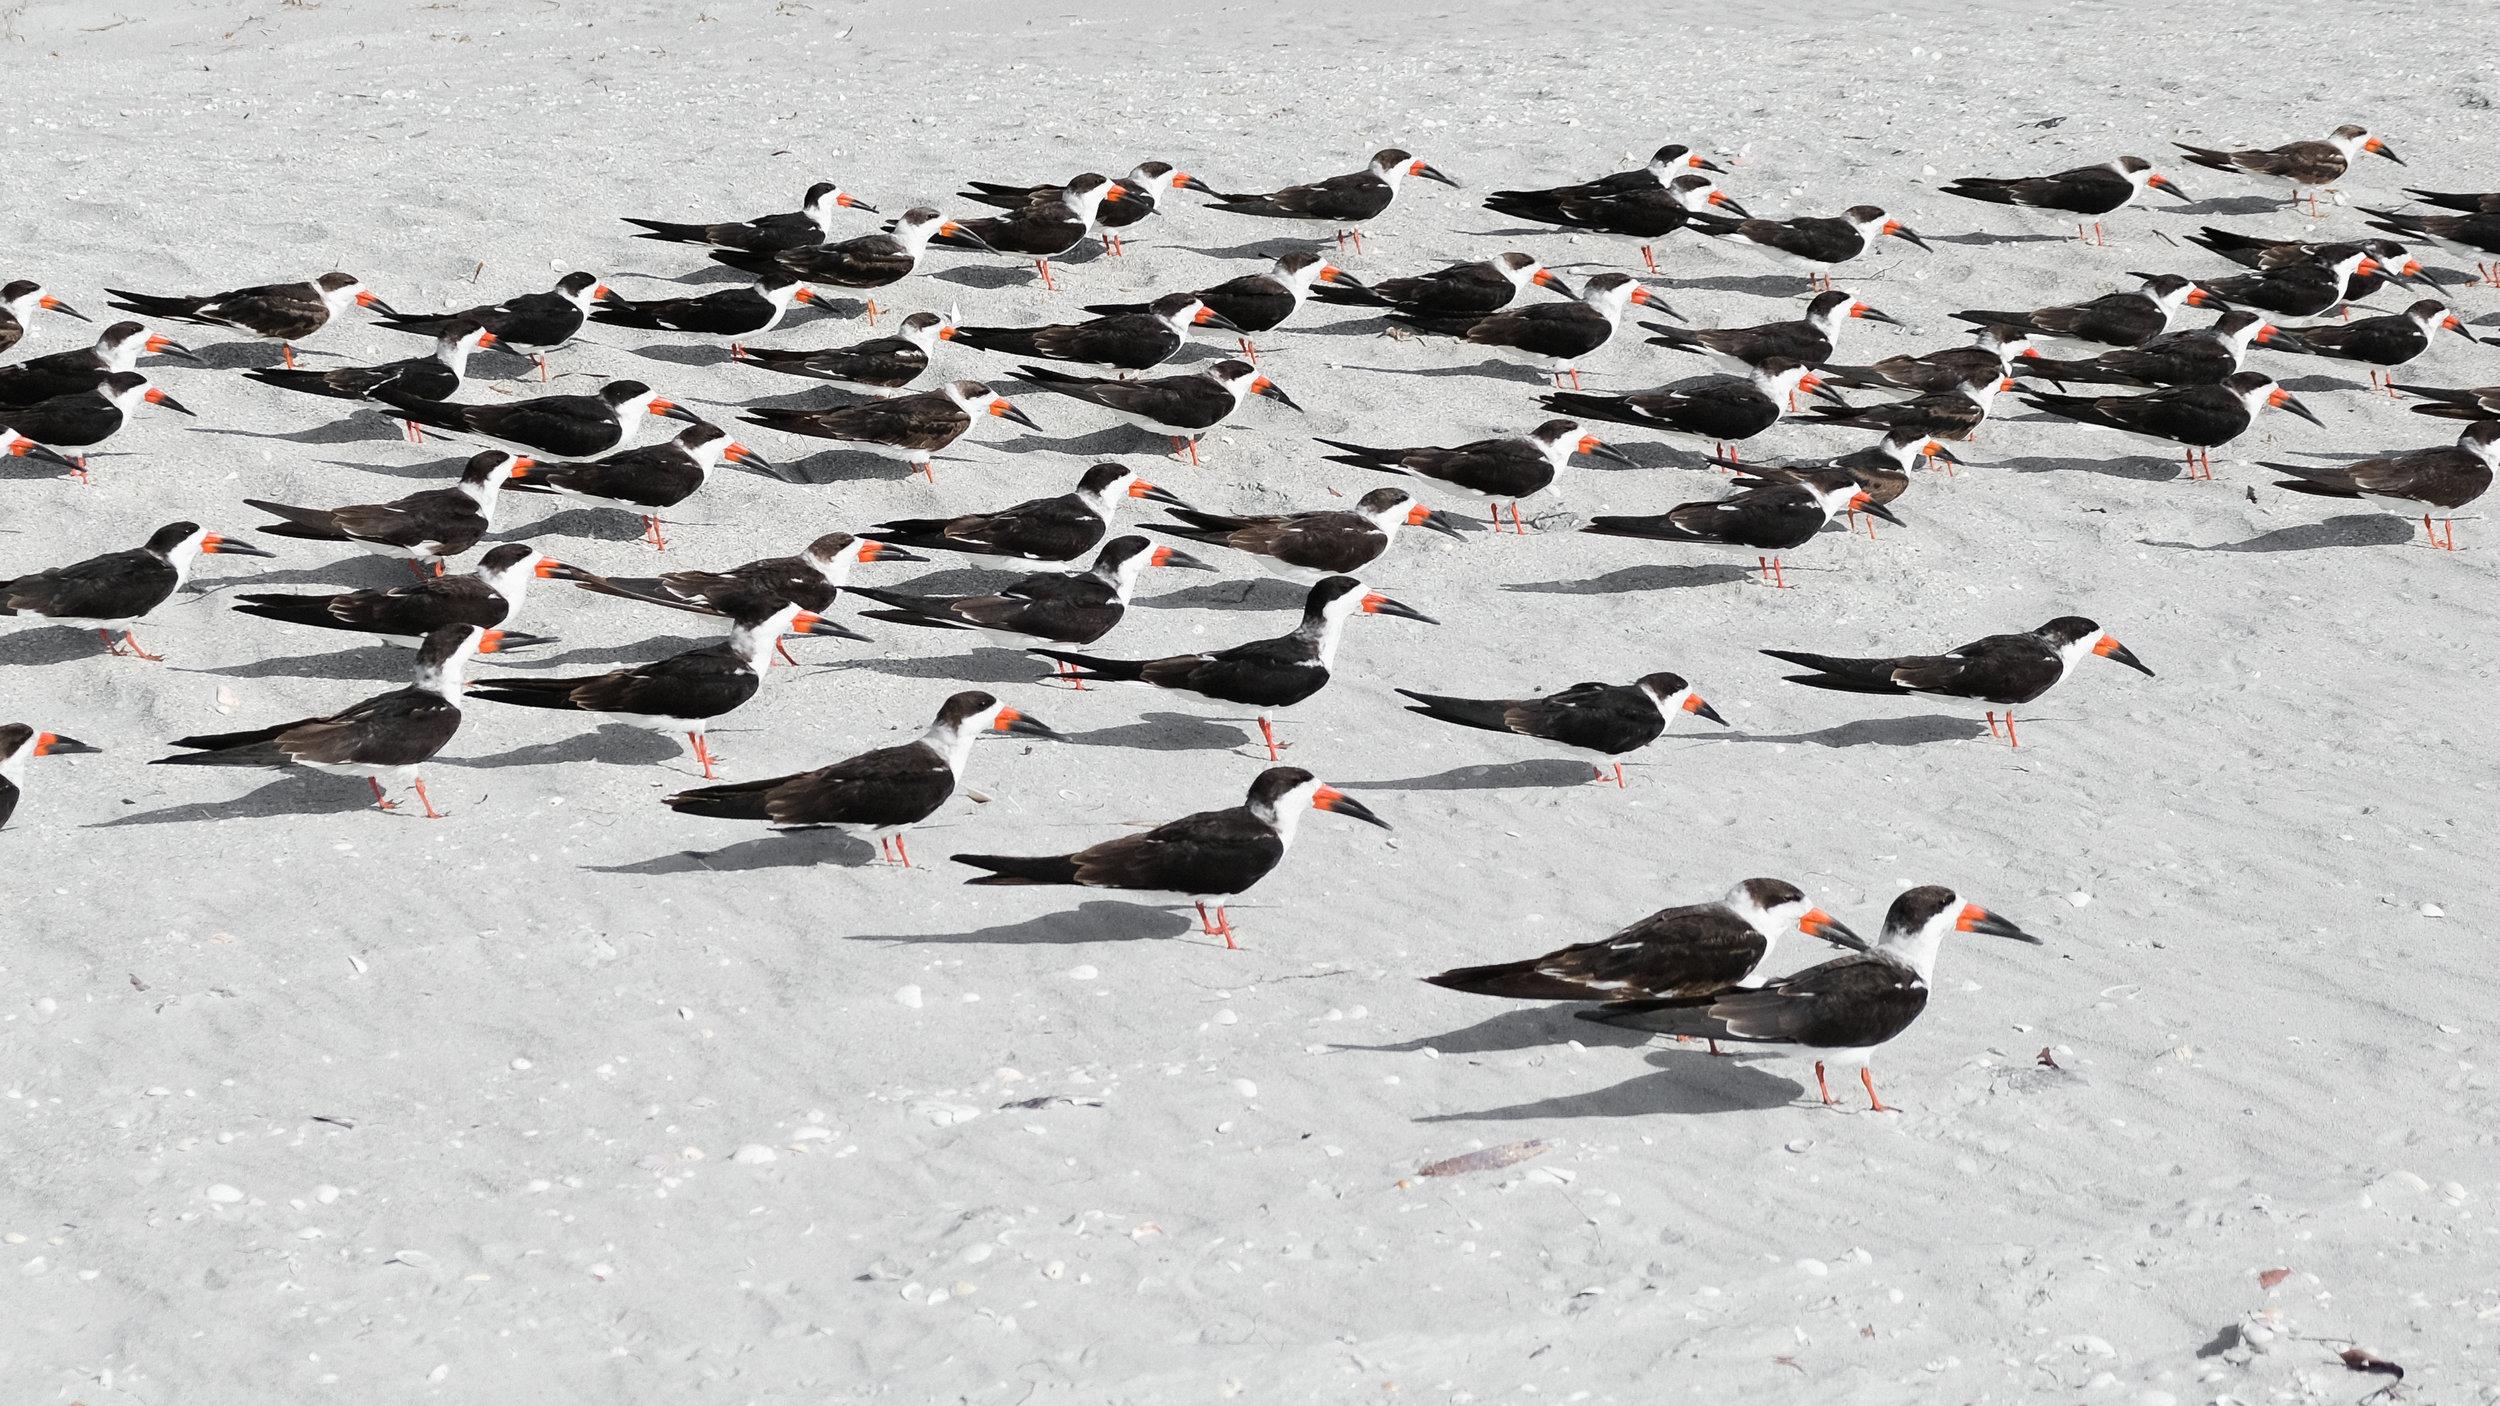 Sanibel Island birds